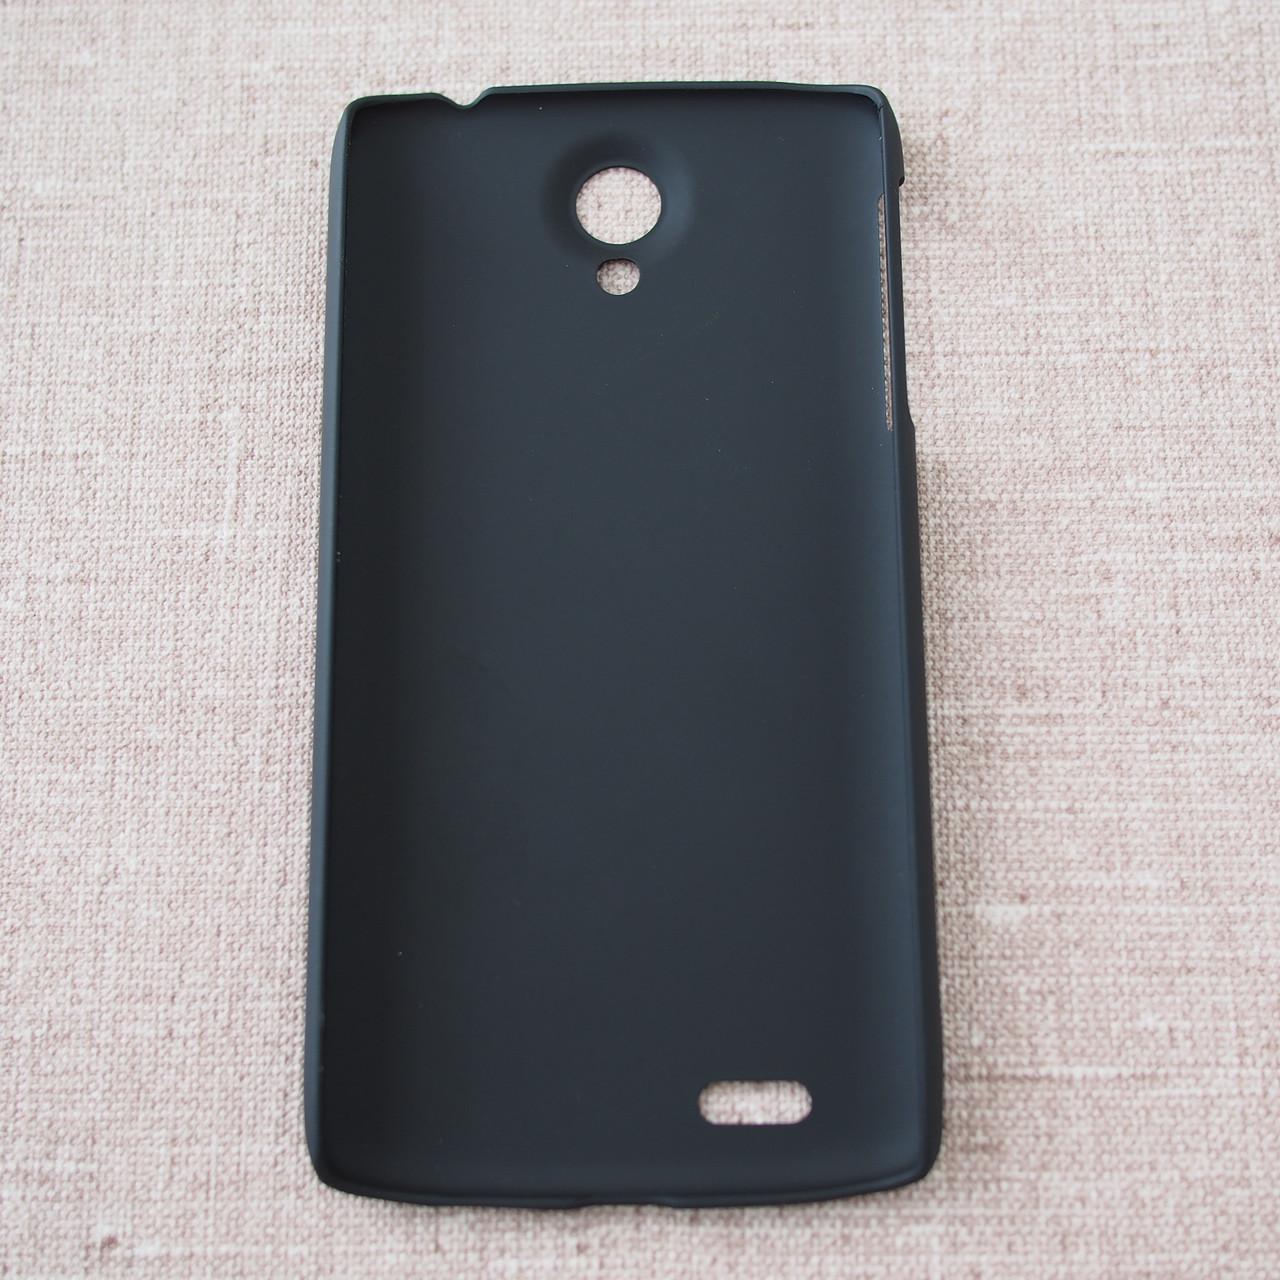 Чехлы для других смартфонов Nillkin Super Frosted Shield Lenovo S820 black Для телефона